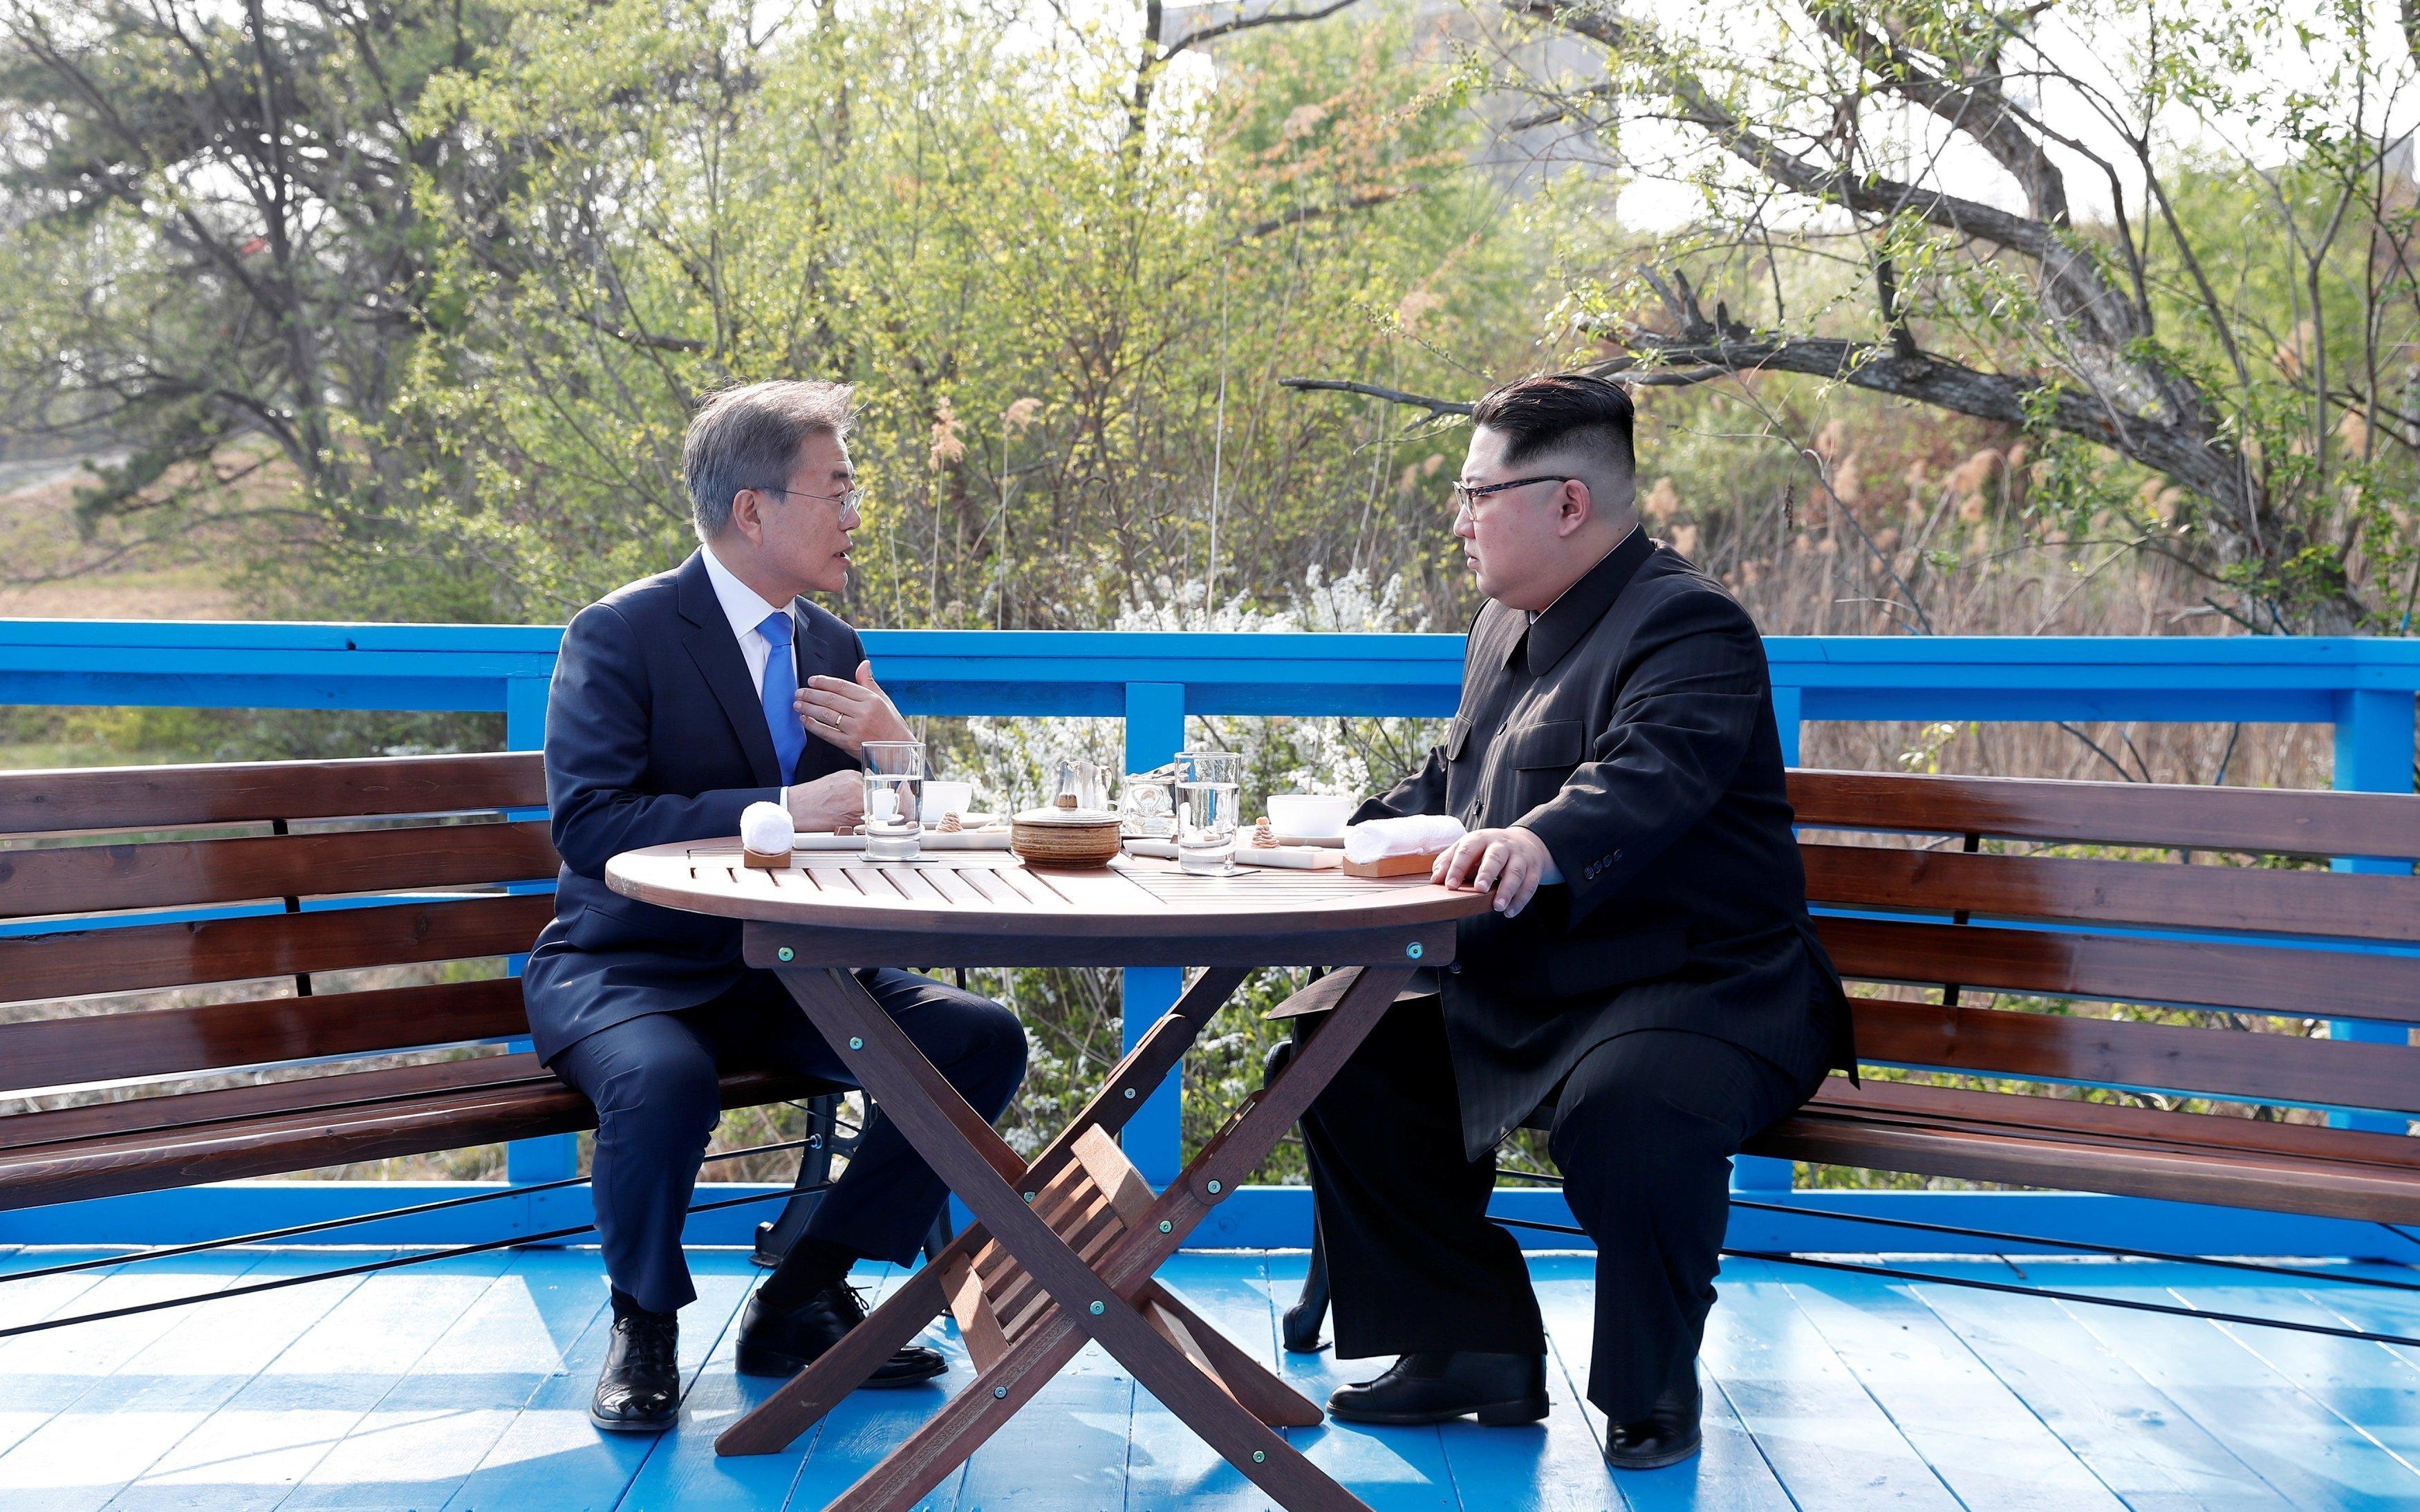 Les dirigeants nord-coréen Kim Jong-un et sud-coréen Moon Jae-in lors du sommet intercoréen